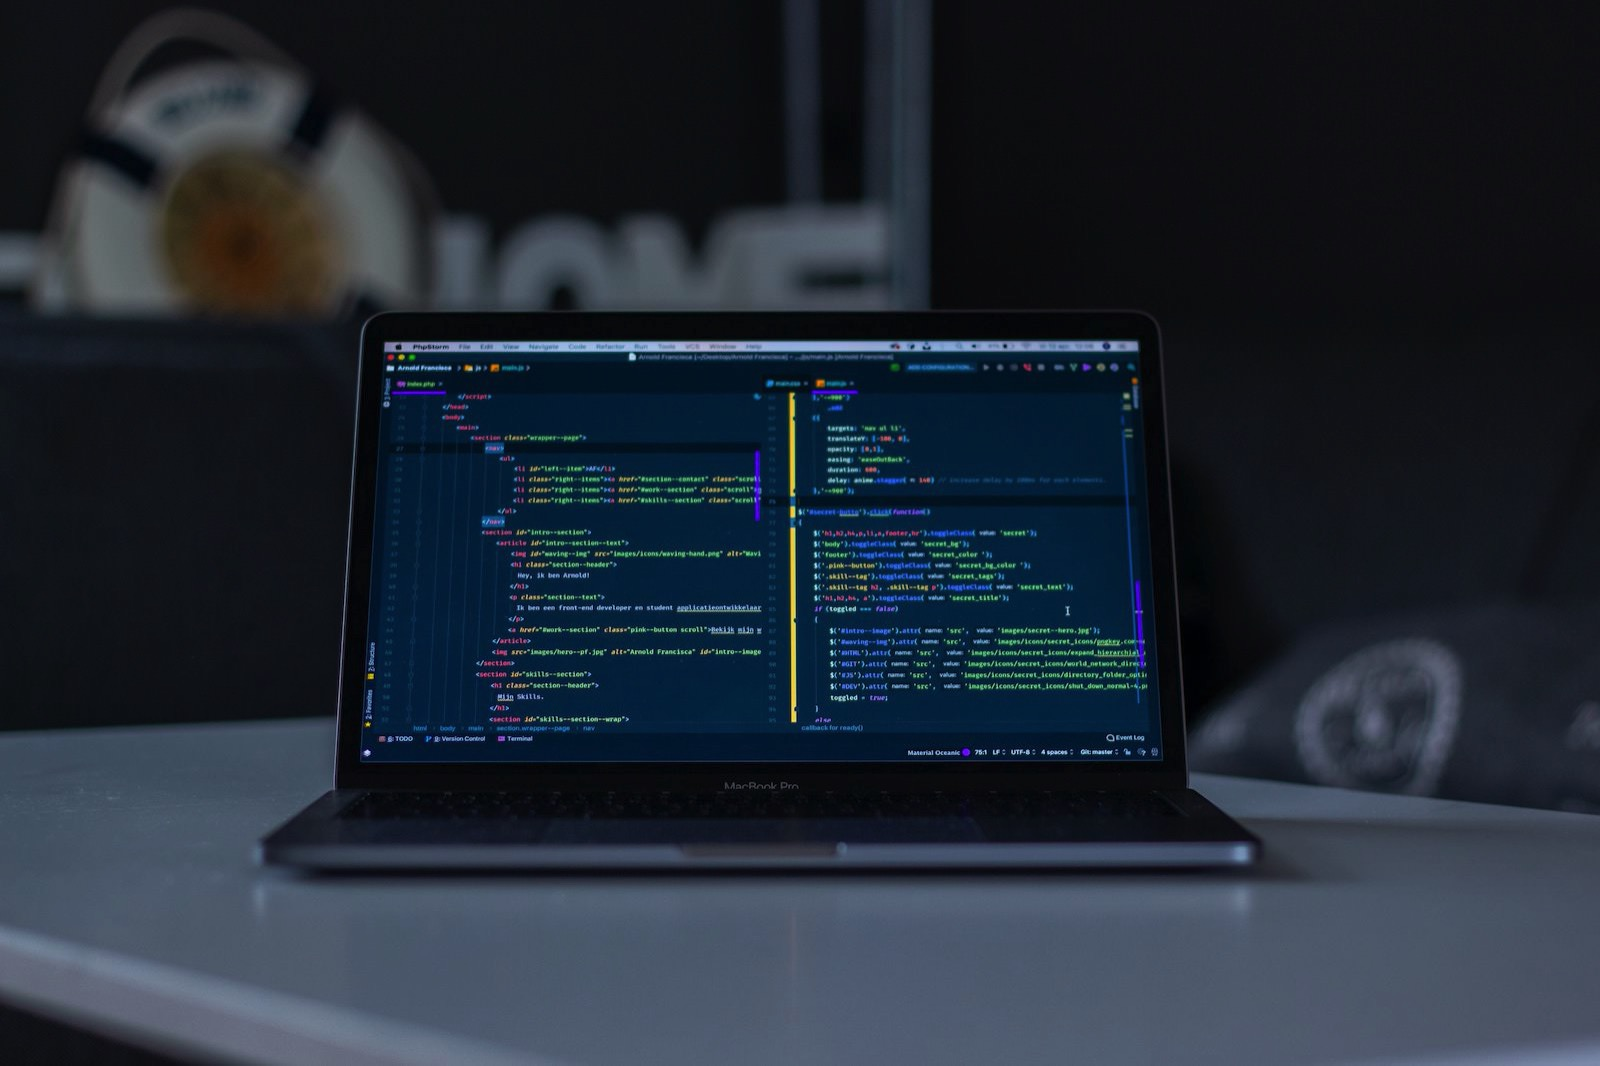 Arnold francisca FBNxmwEVpAc unsplash macbookpro code